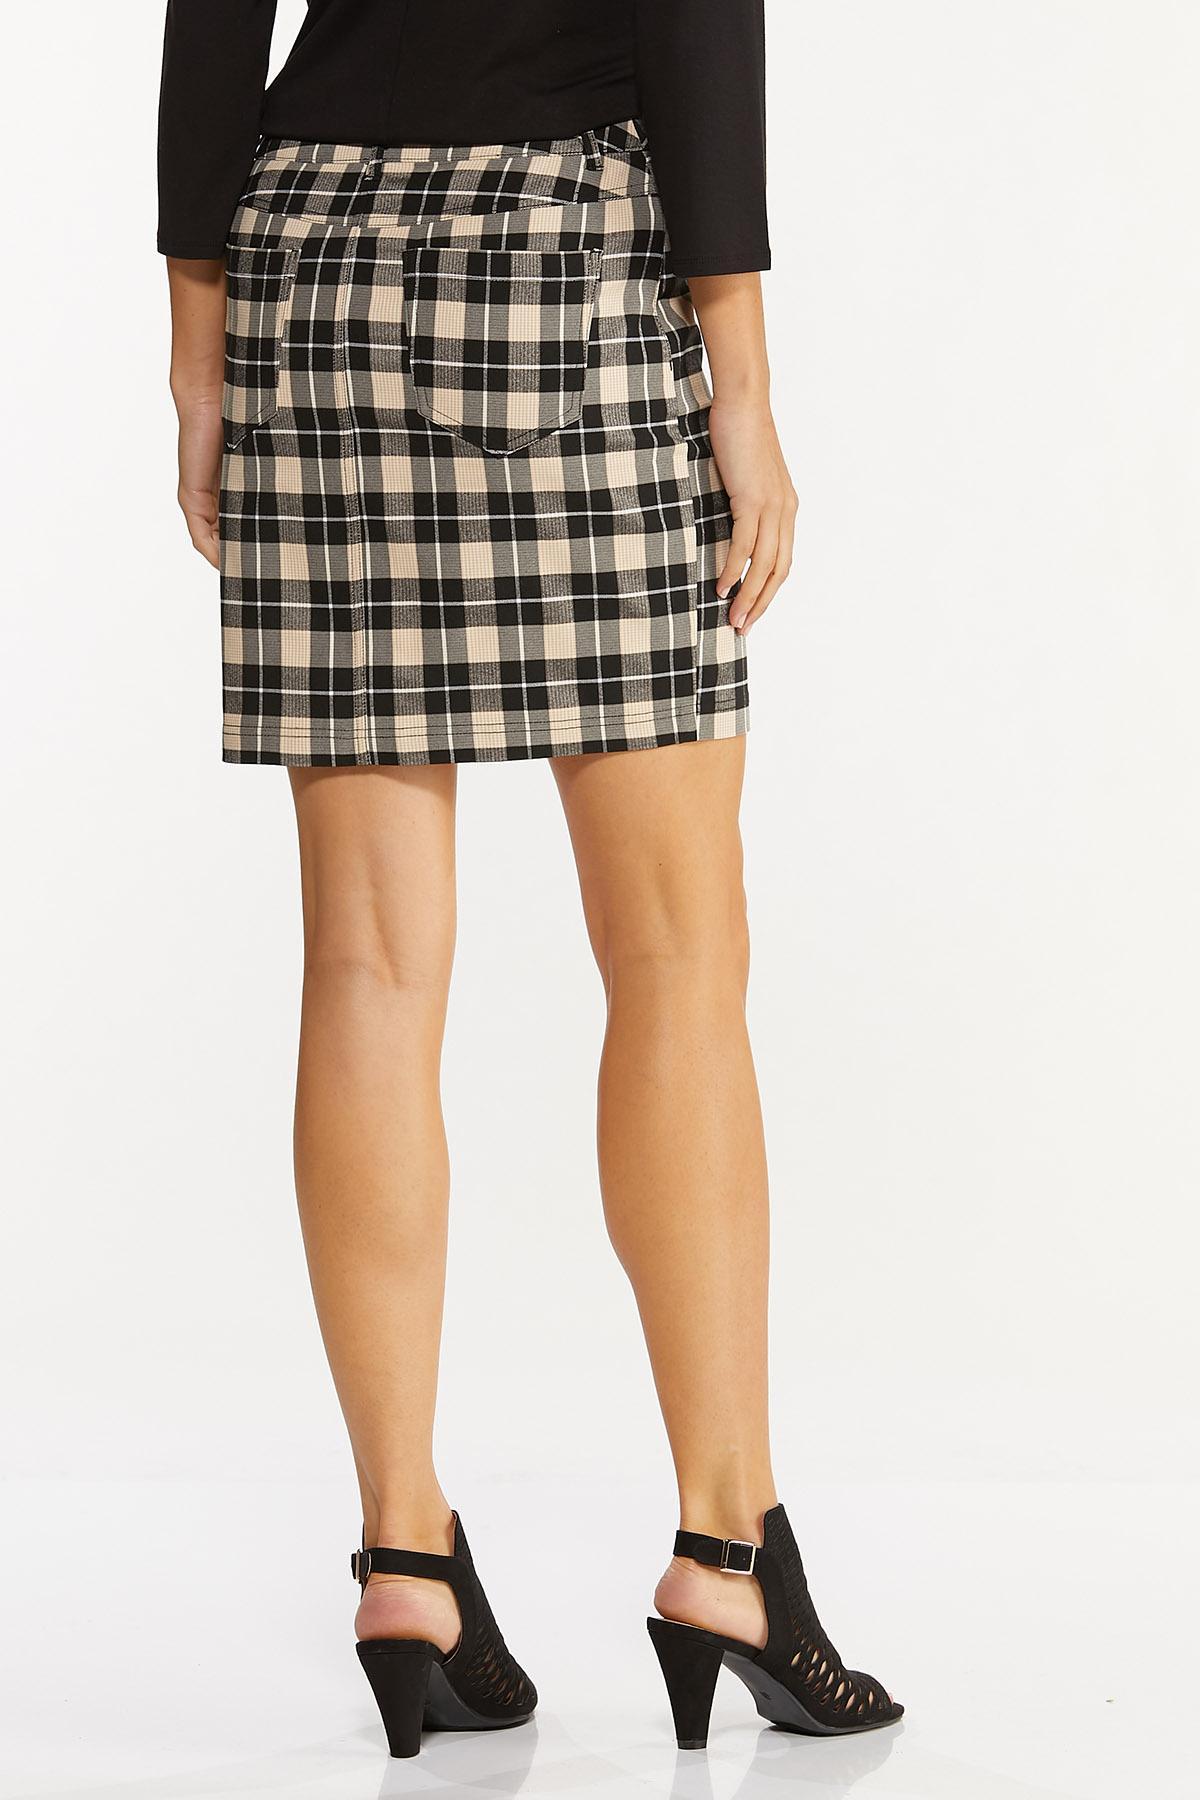 Neutral Plaid Mini Skirt (Item #44642133)